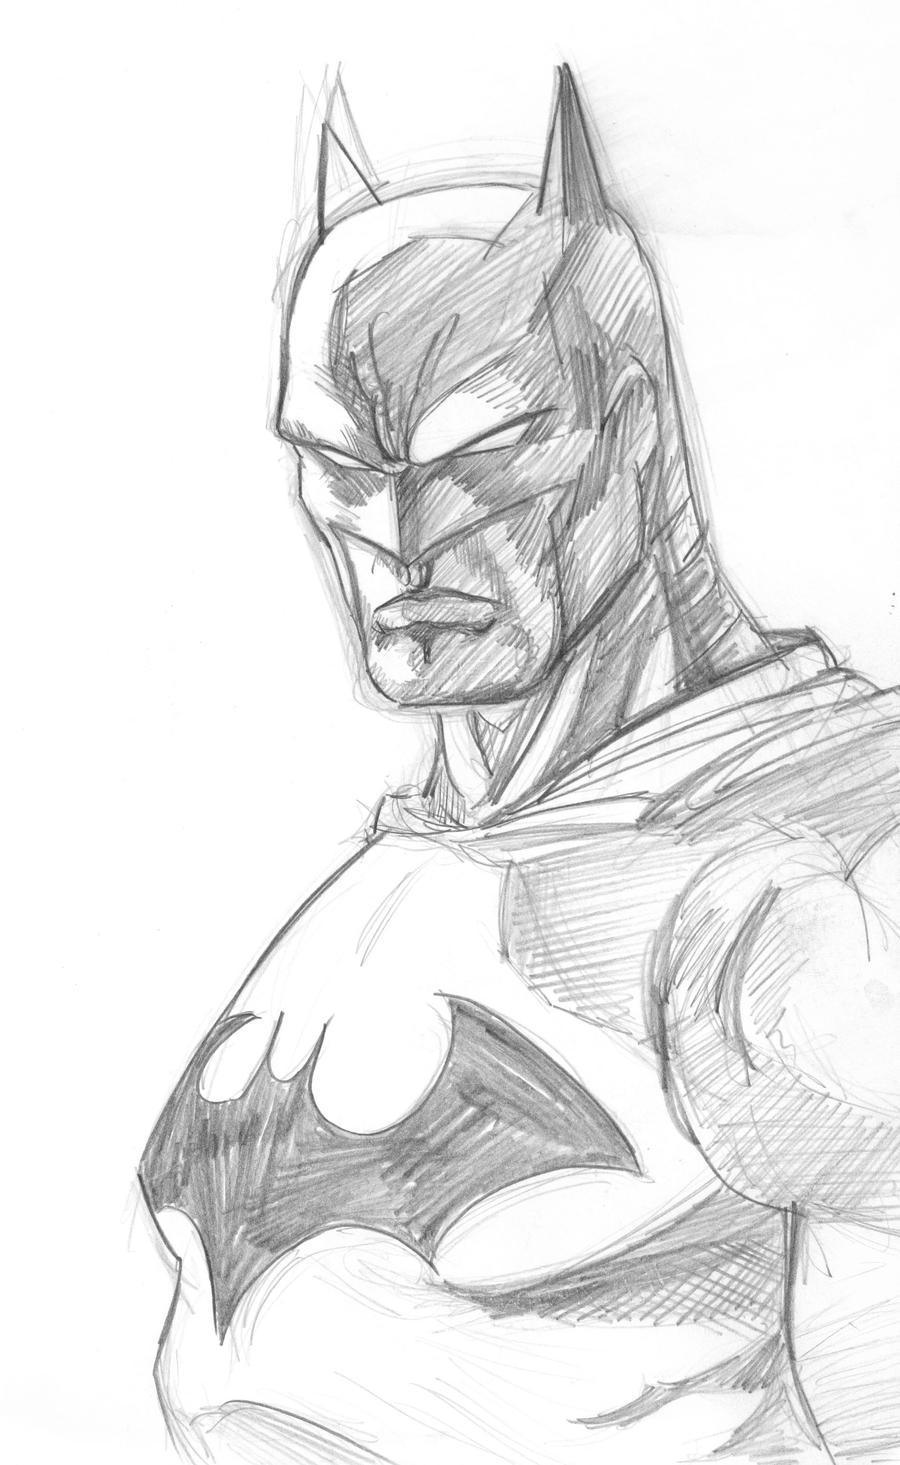 batman 3 by Theamat on DeviantArt